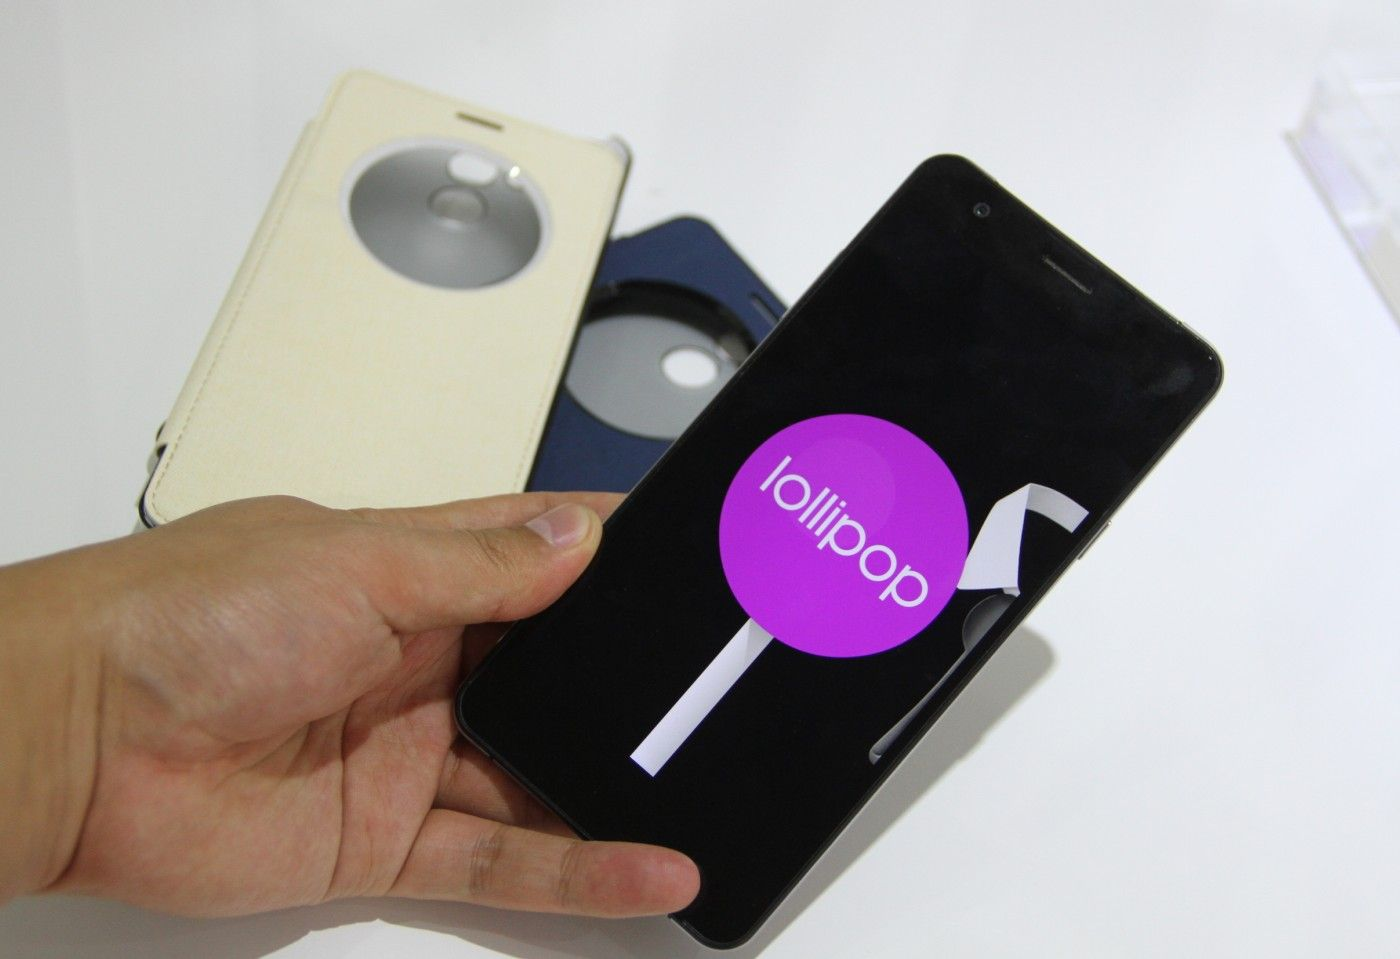 8 efox, Elephone, flash sales, mercado mobile, smartphone